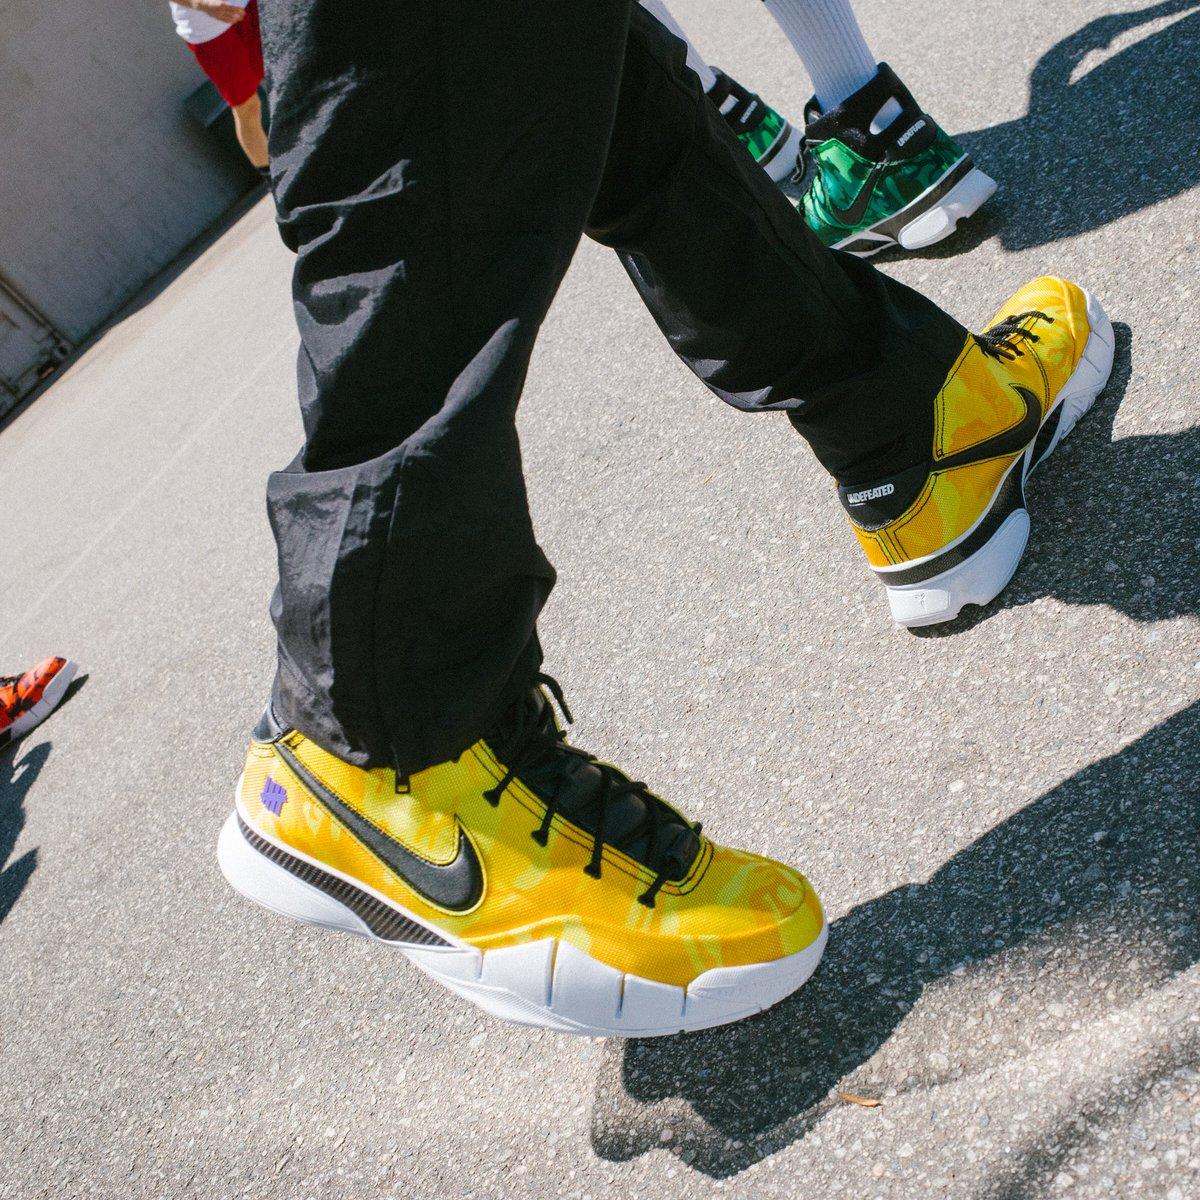 honor Kobe Bryant Day teamed Nike SNKRS App release Nike